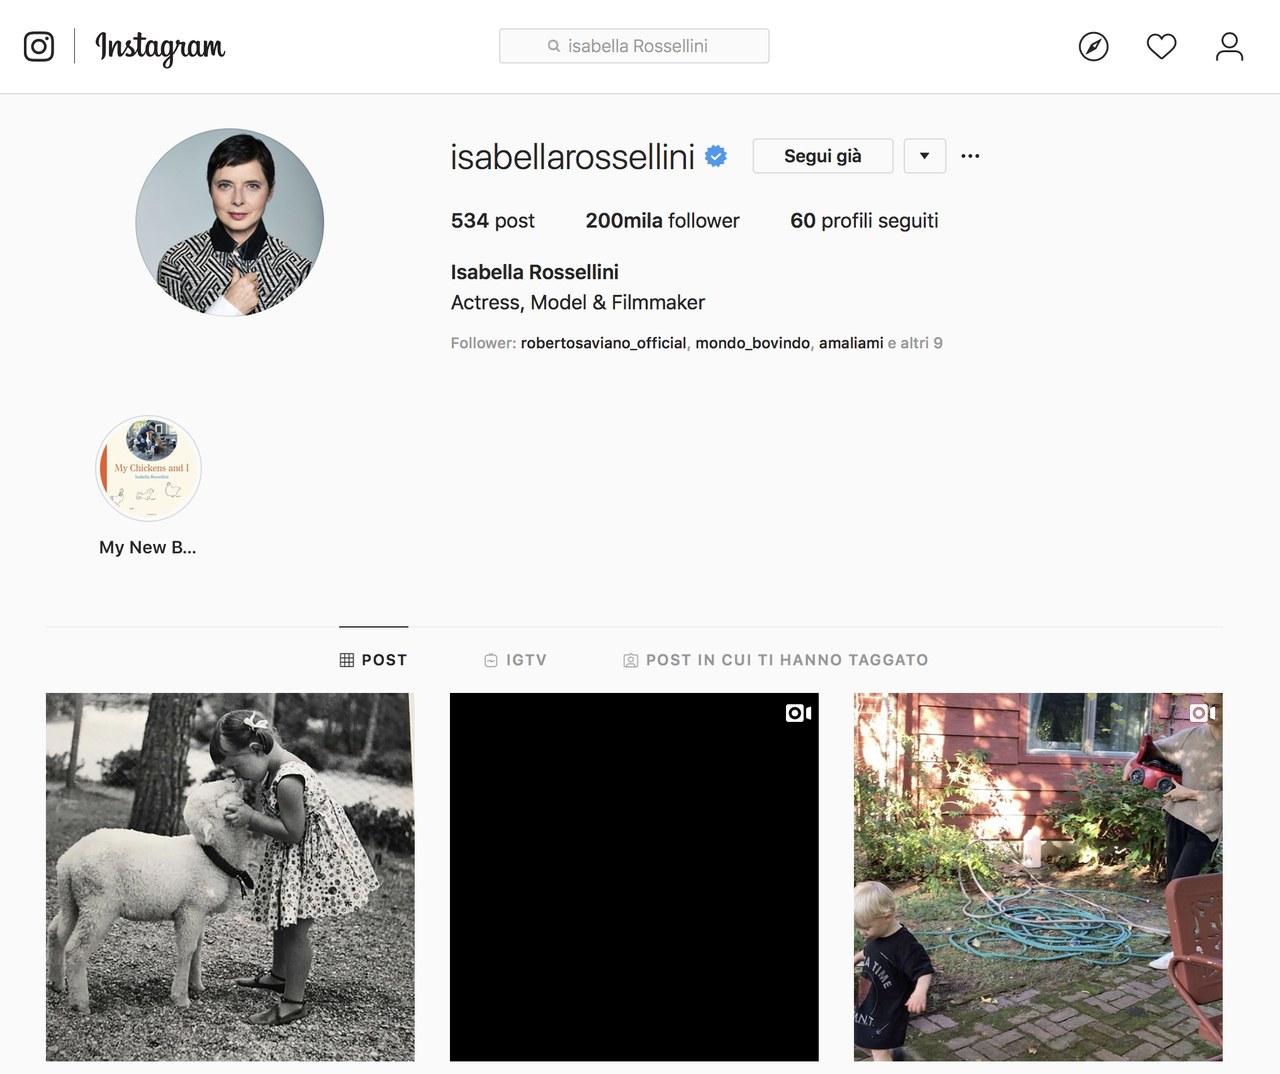 Pagina Instagram di Isabella Rossellini